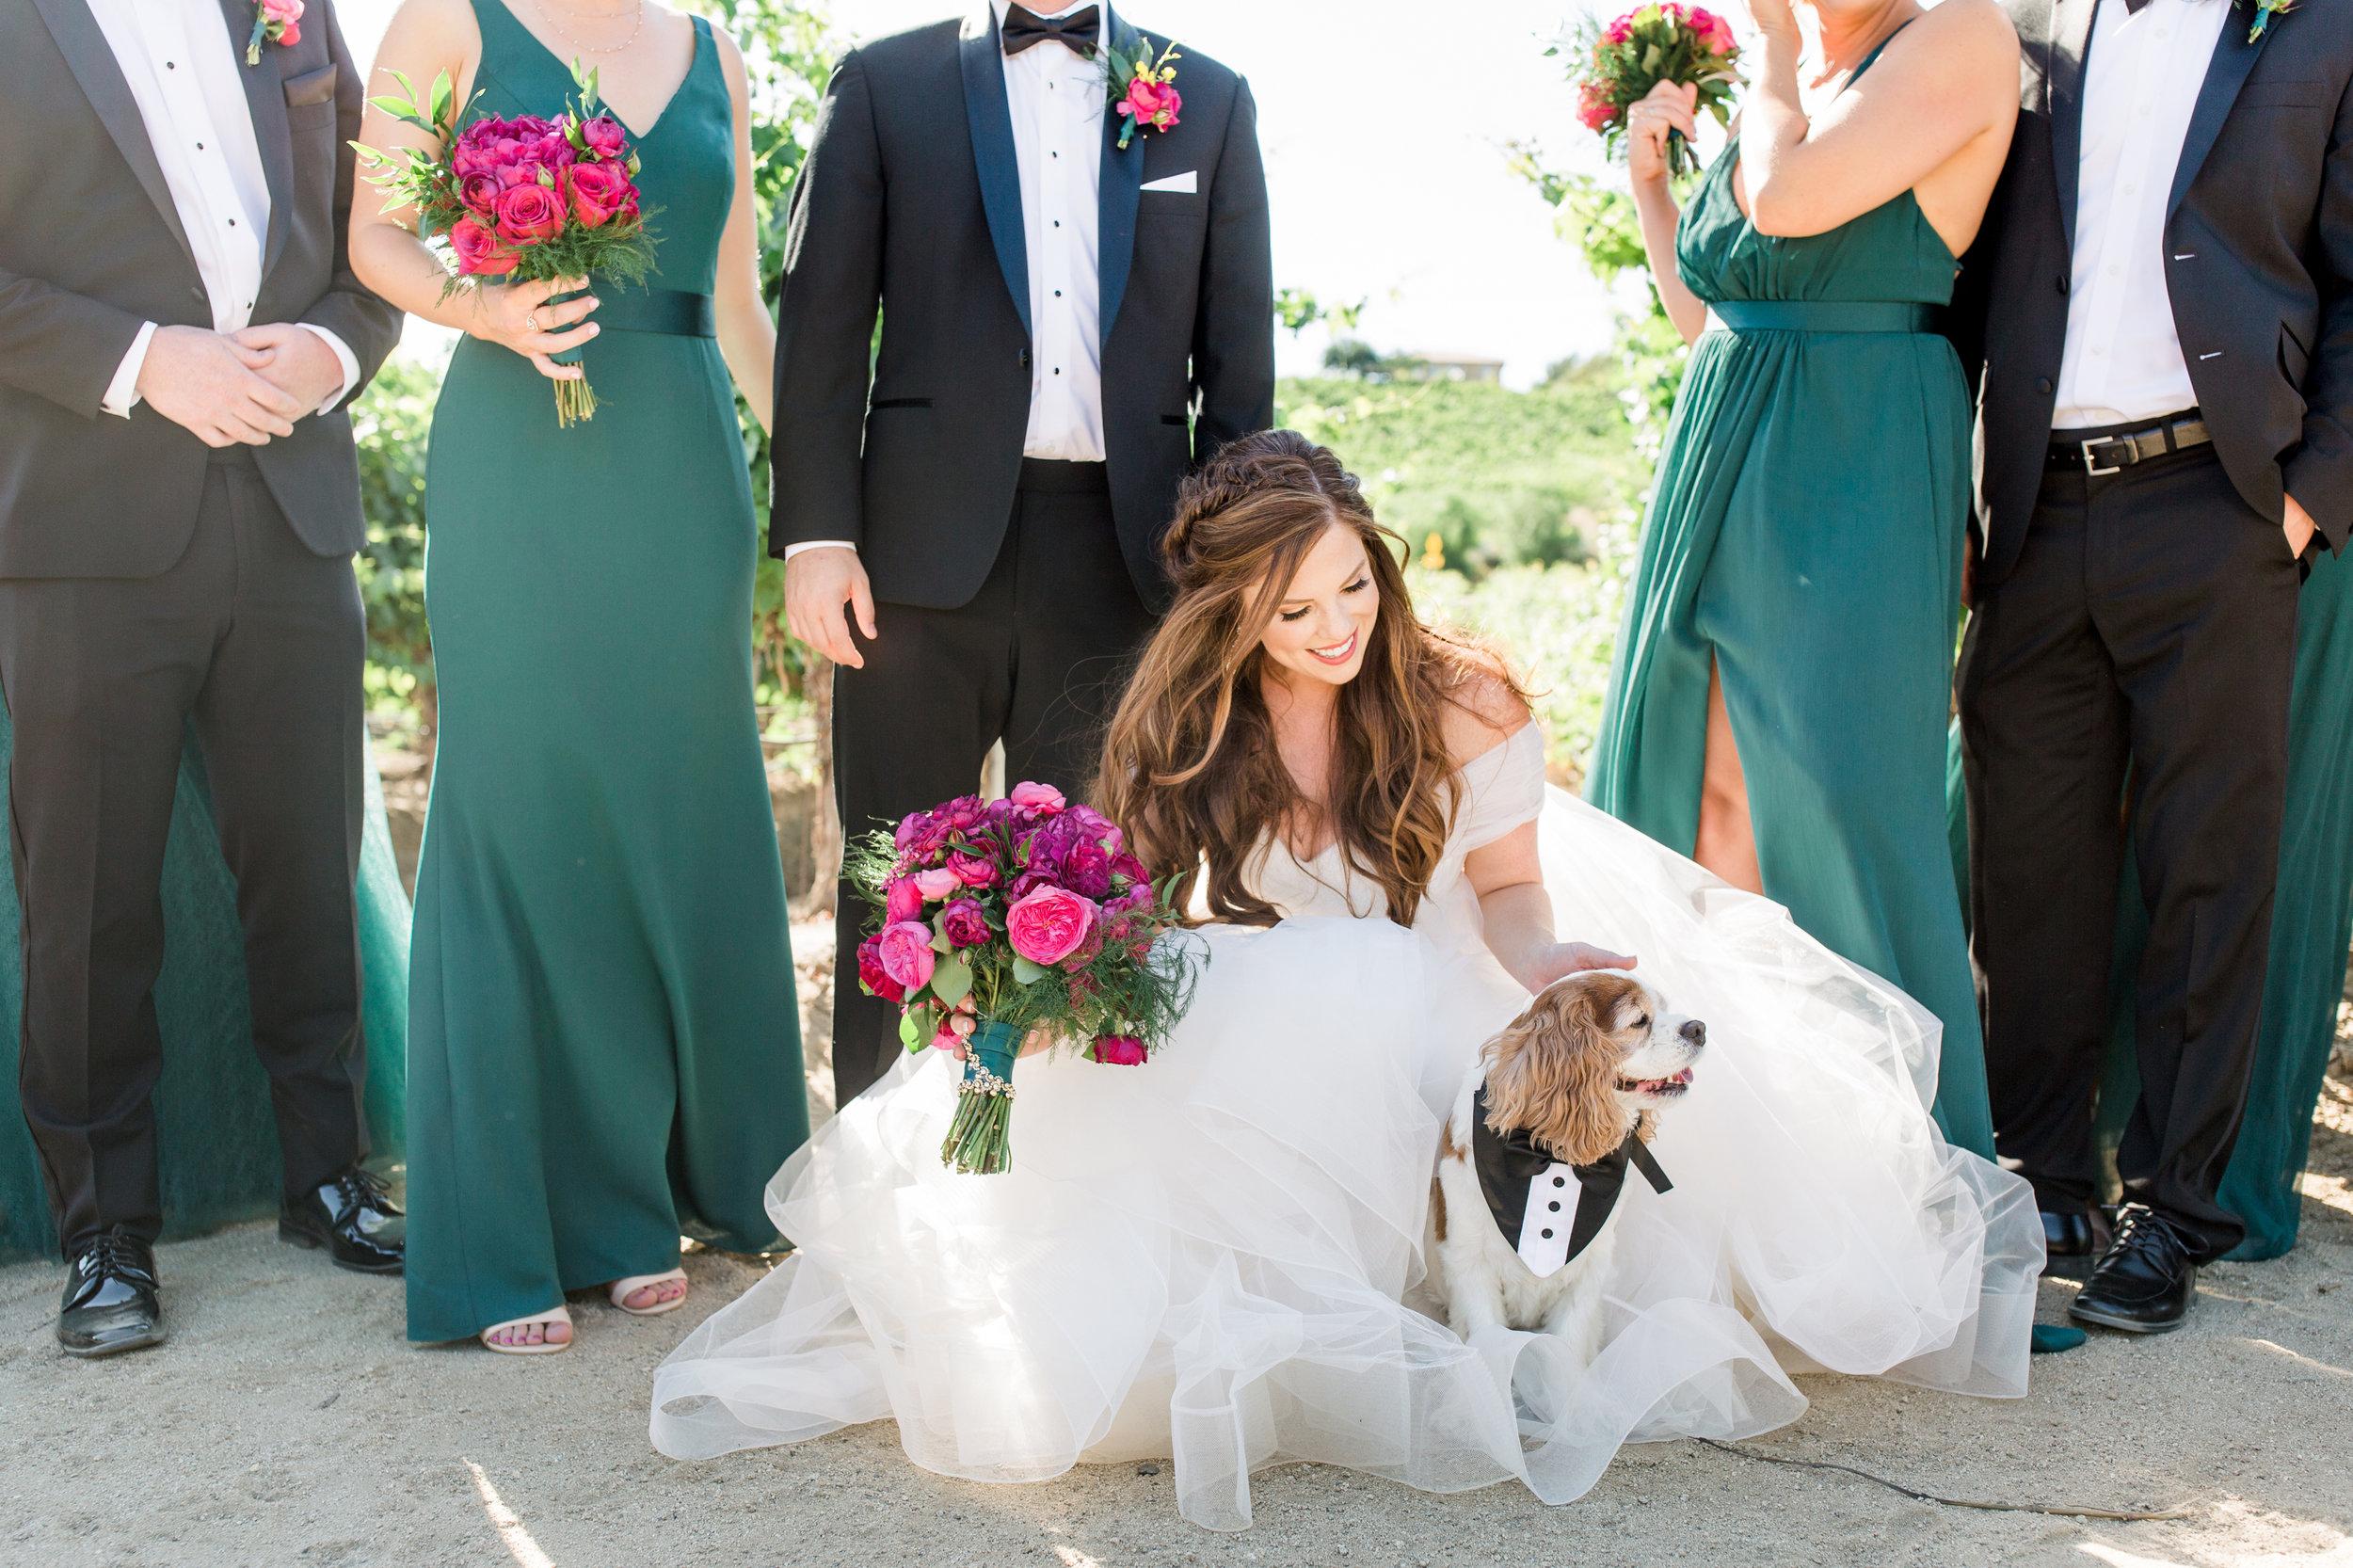 Leoness Cellars Winery Wedding Photographer Leah Vis  (1).jpg